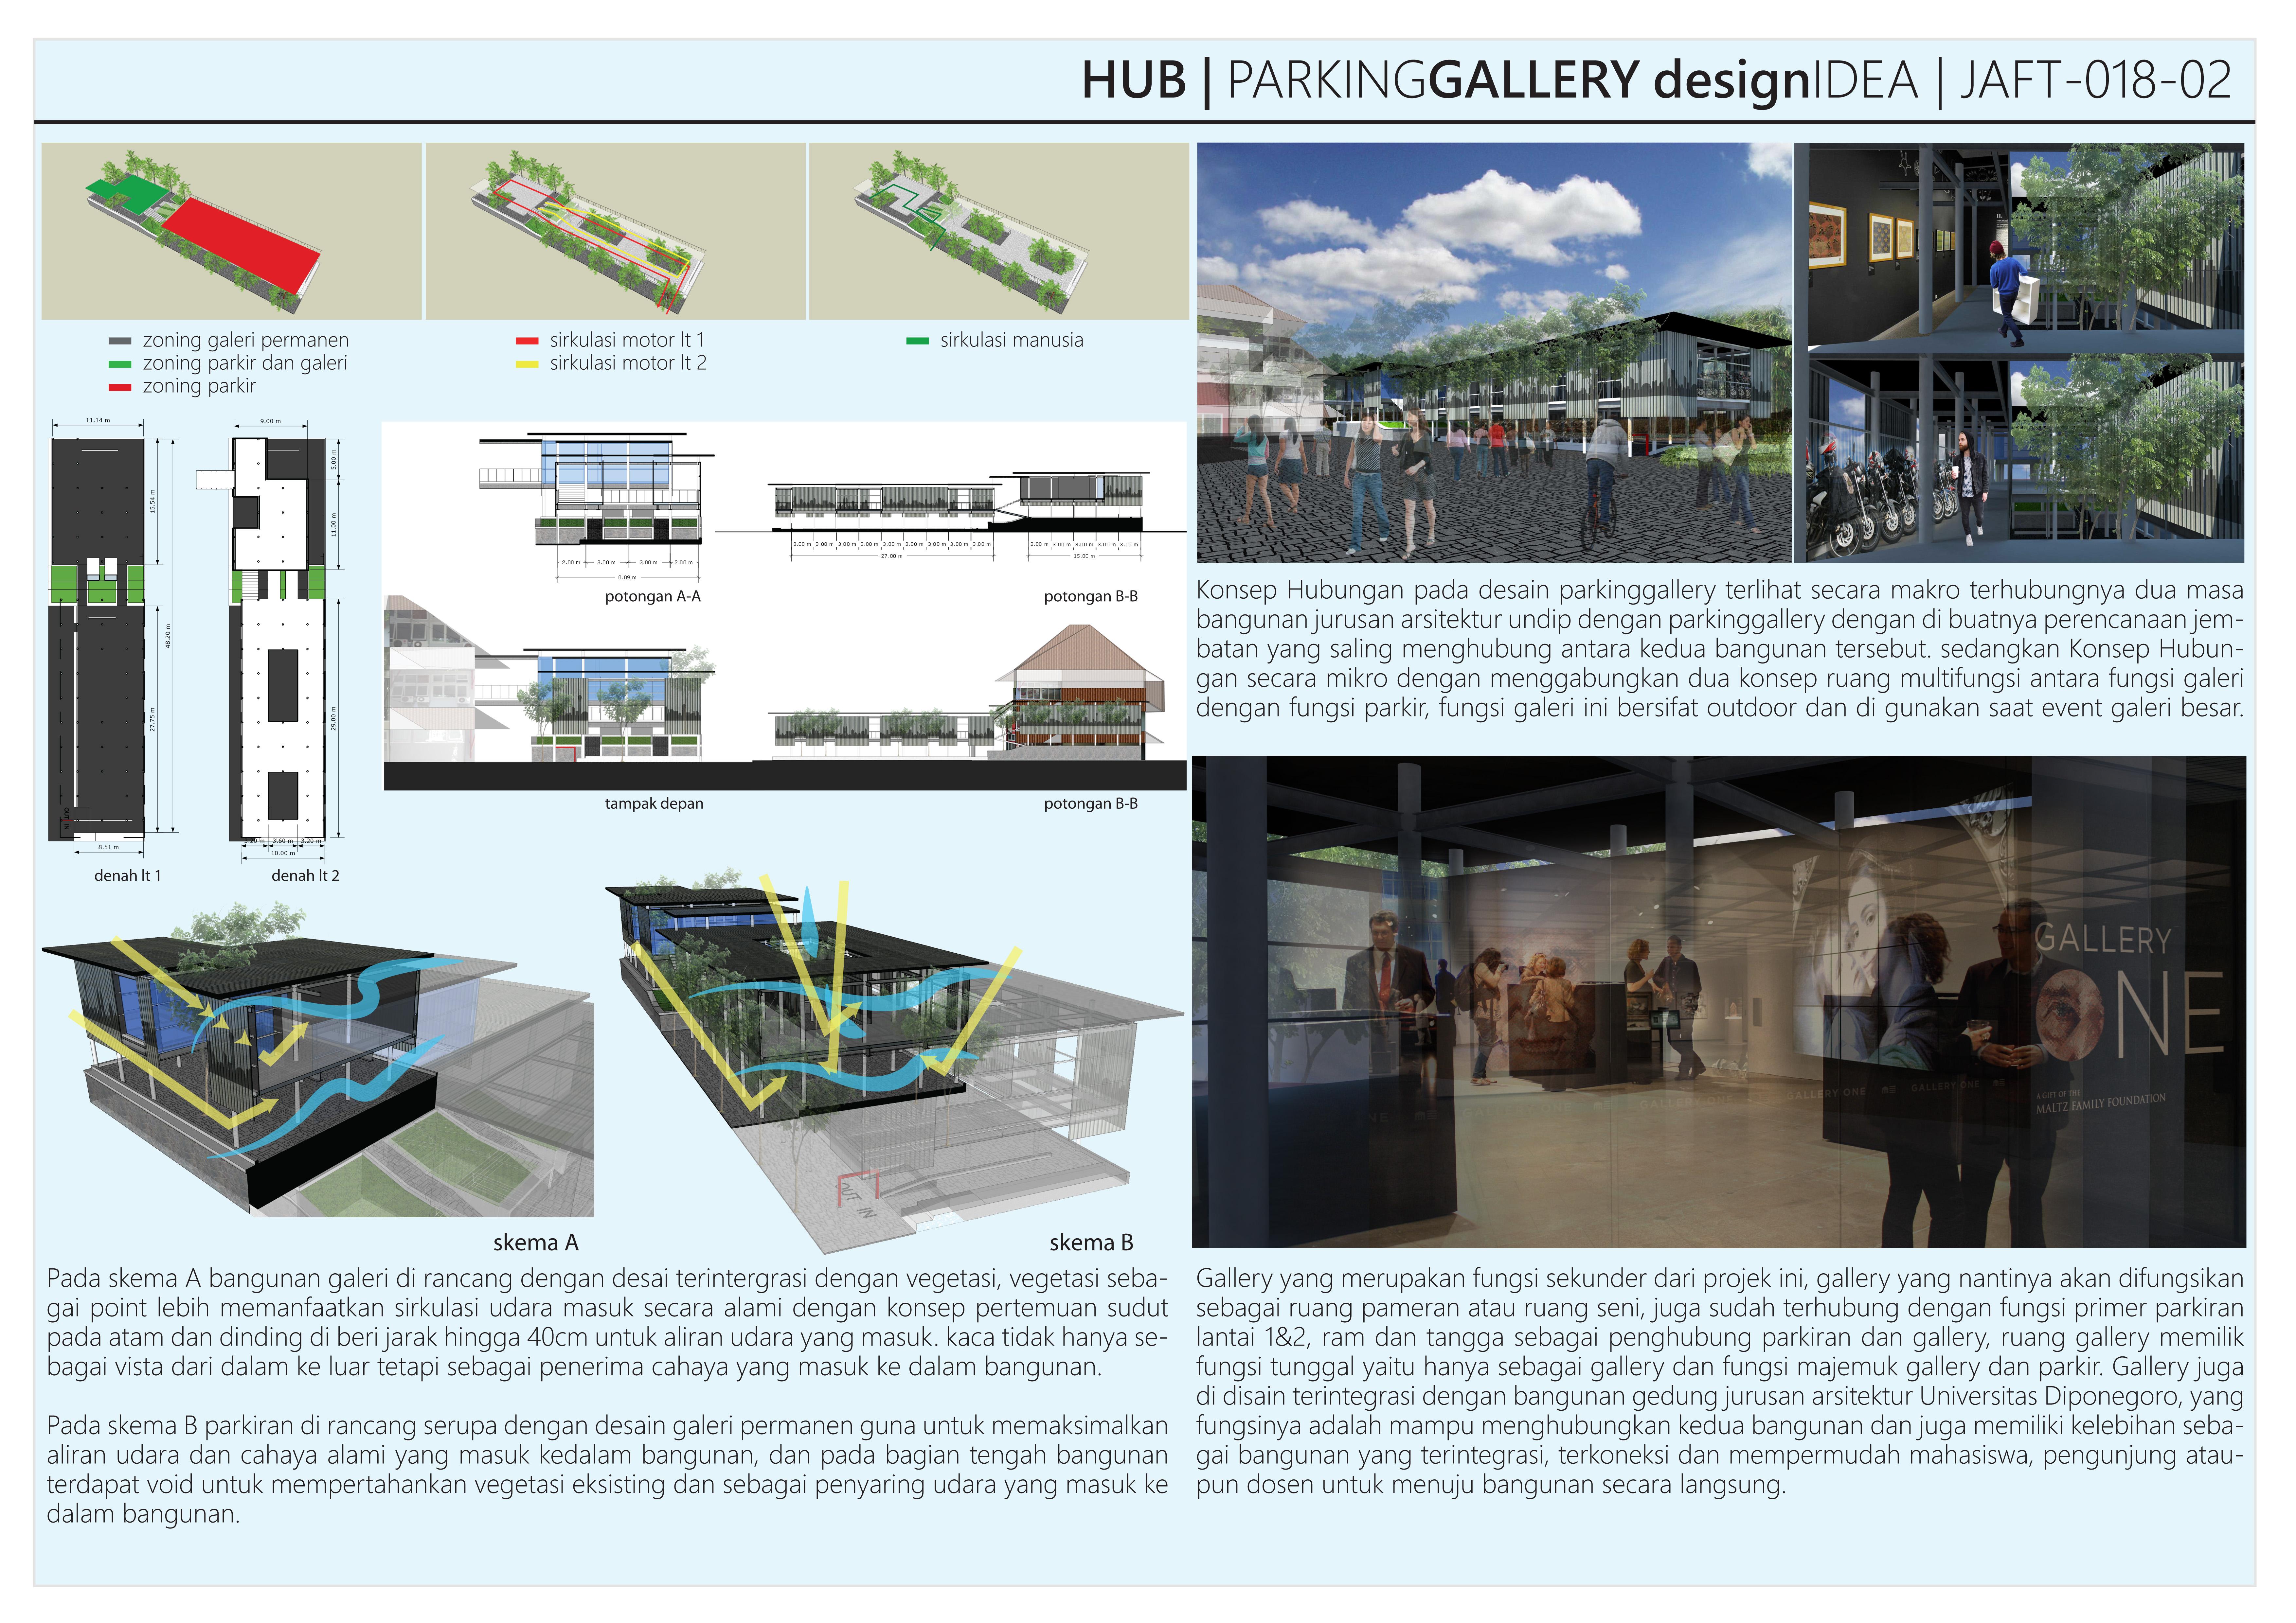 4400 Koleksi Foto Desain Arsitektur Undip HD Gratid Download Gratis